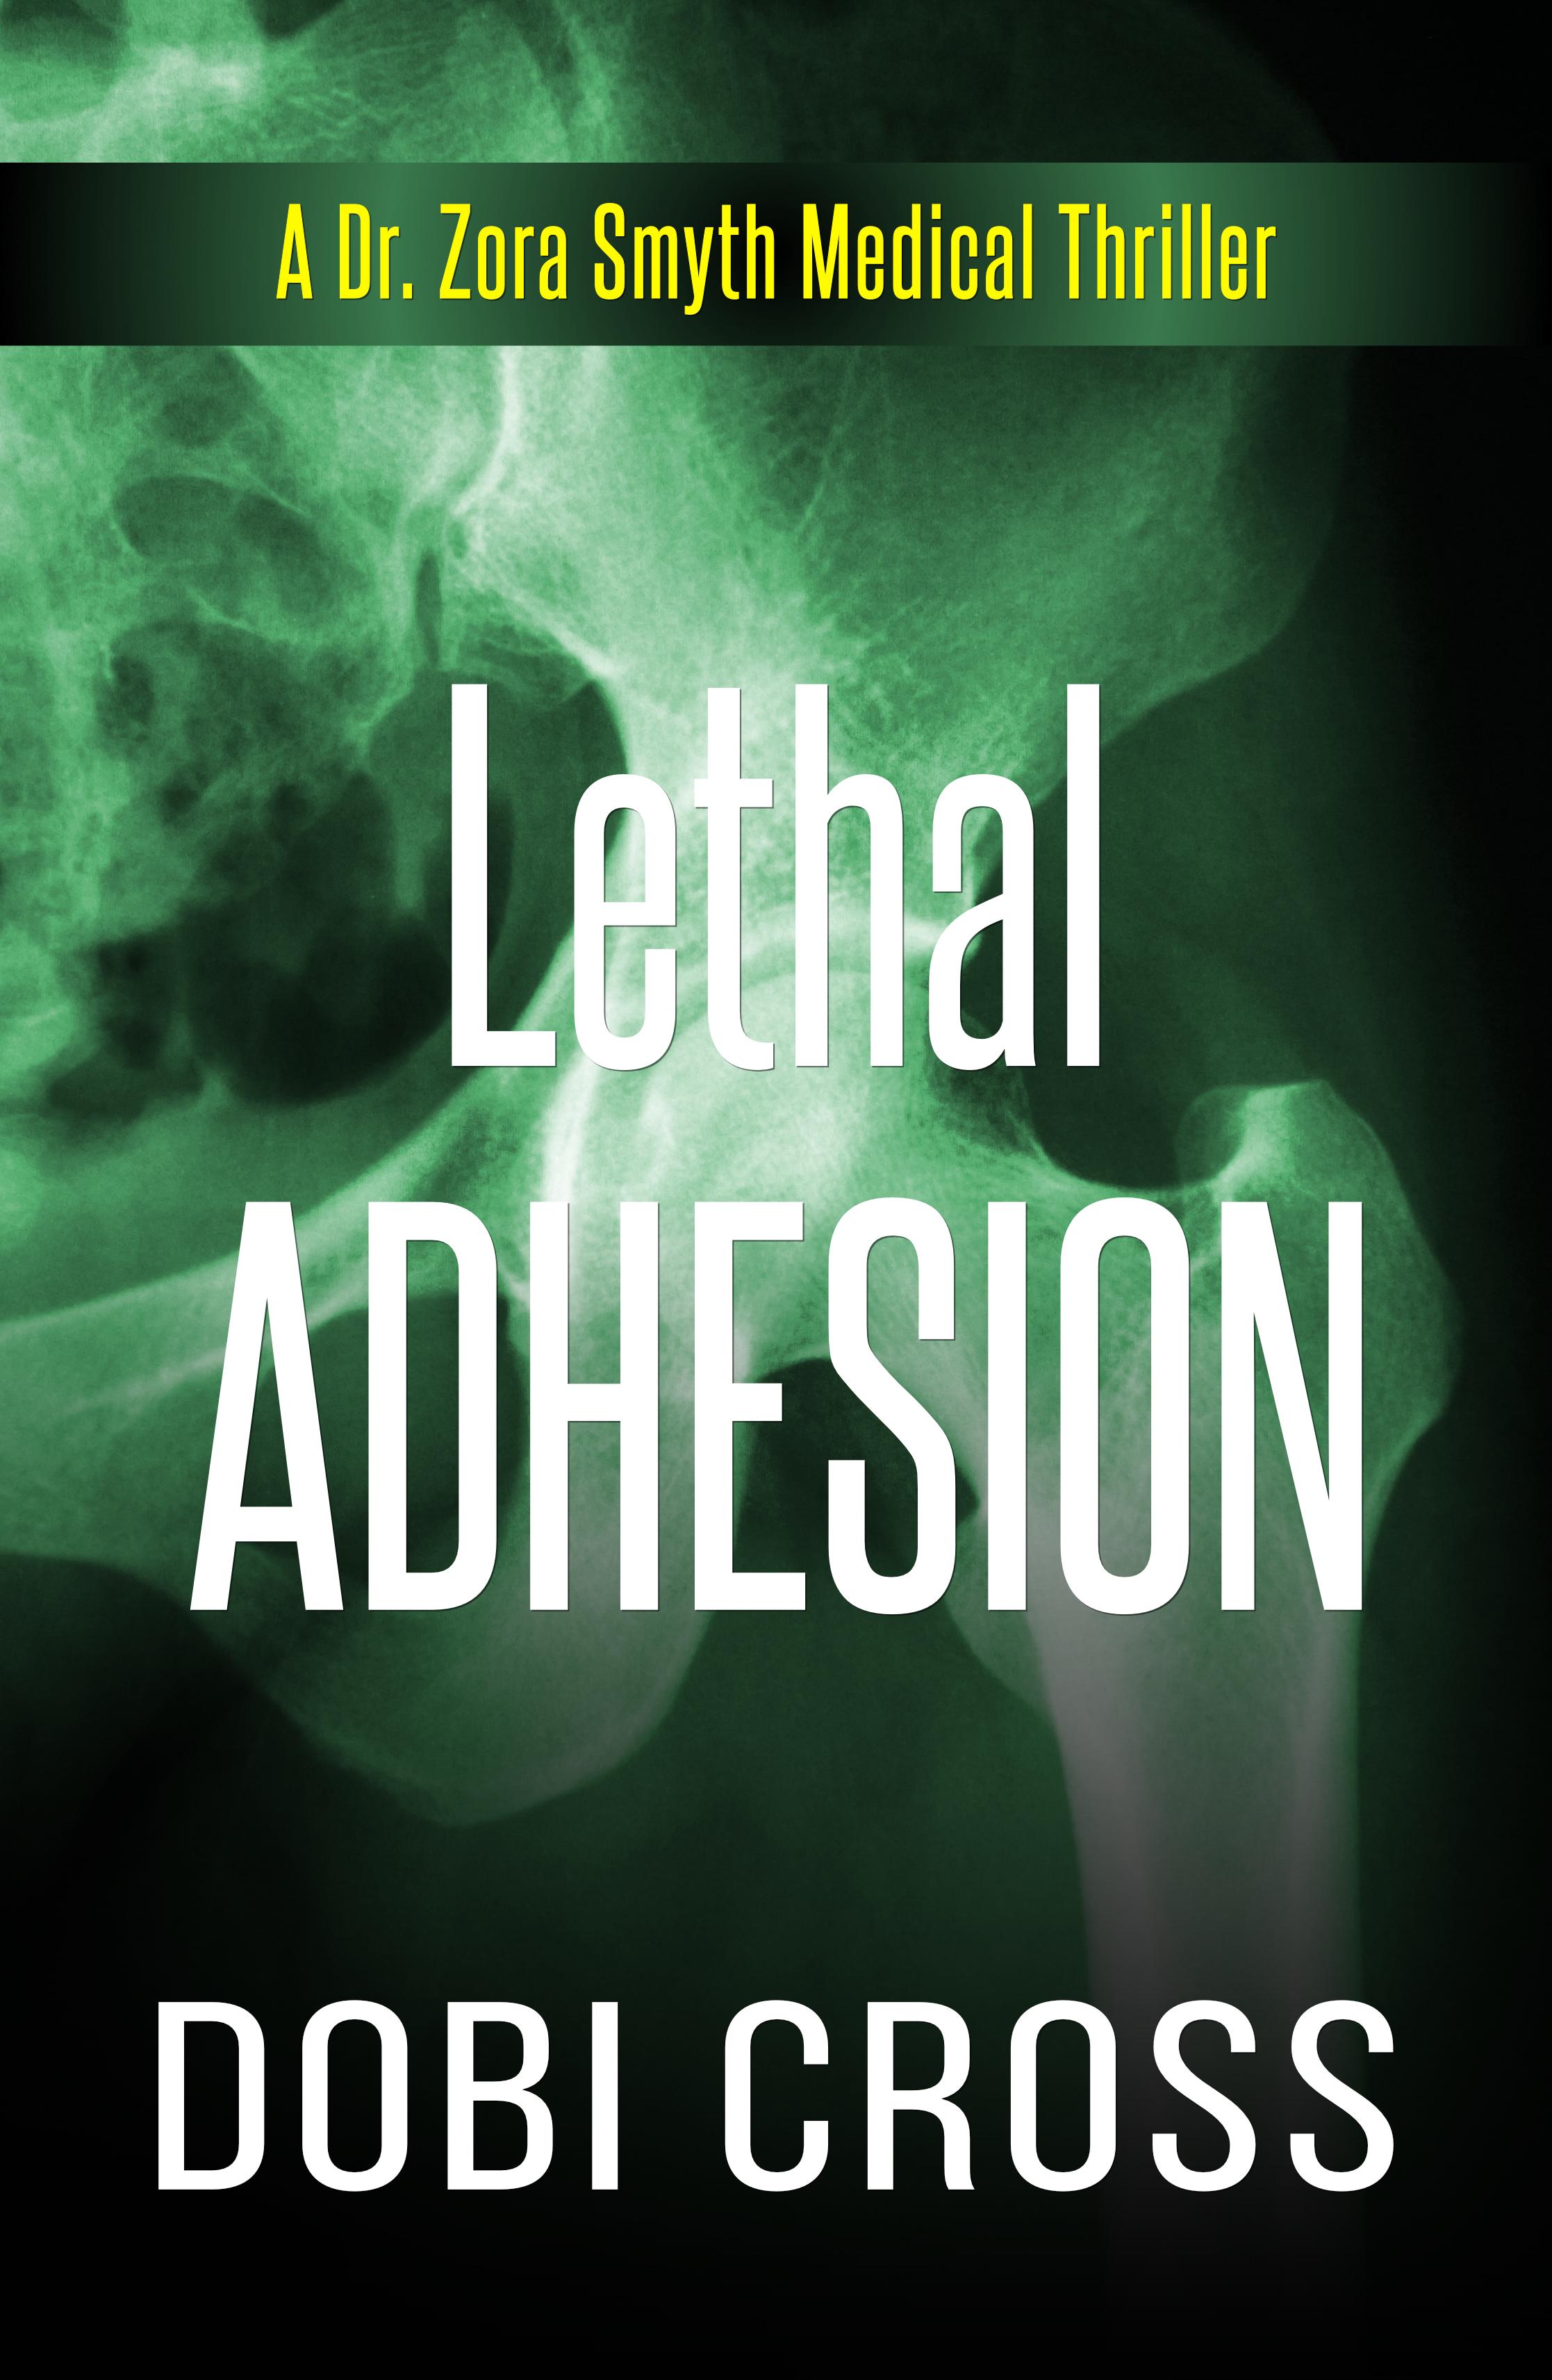 Lethal Adhesion (Dr. Zora Smyth Medical Thriller #5)